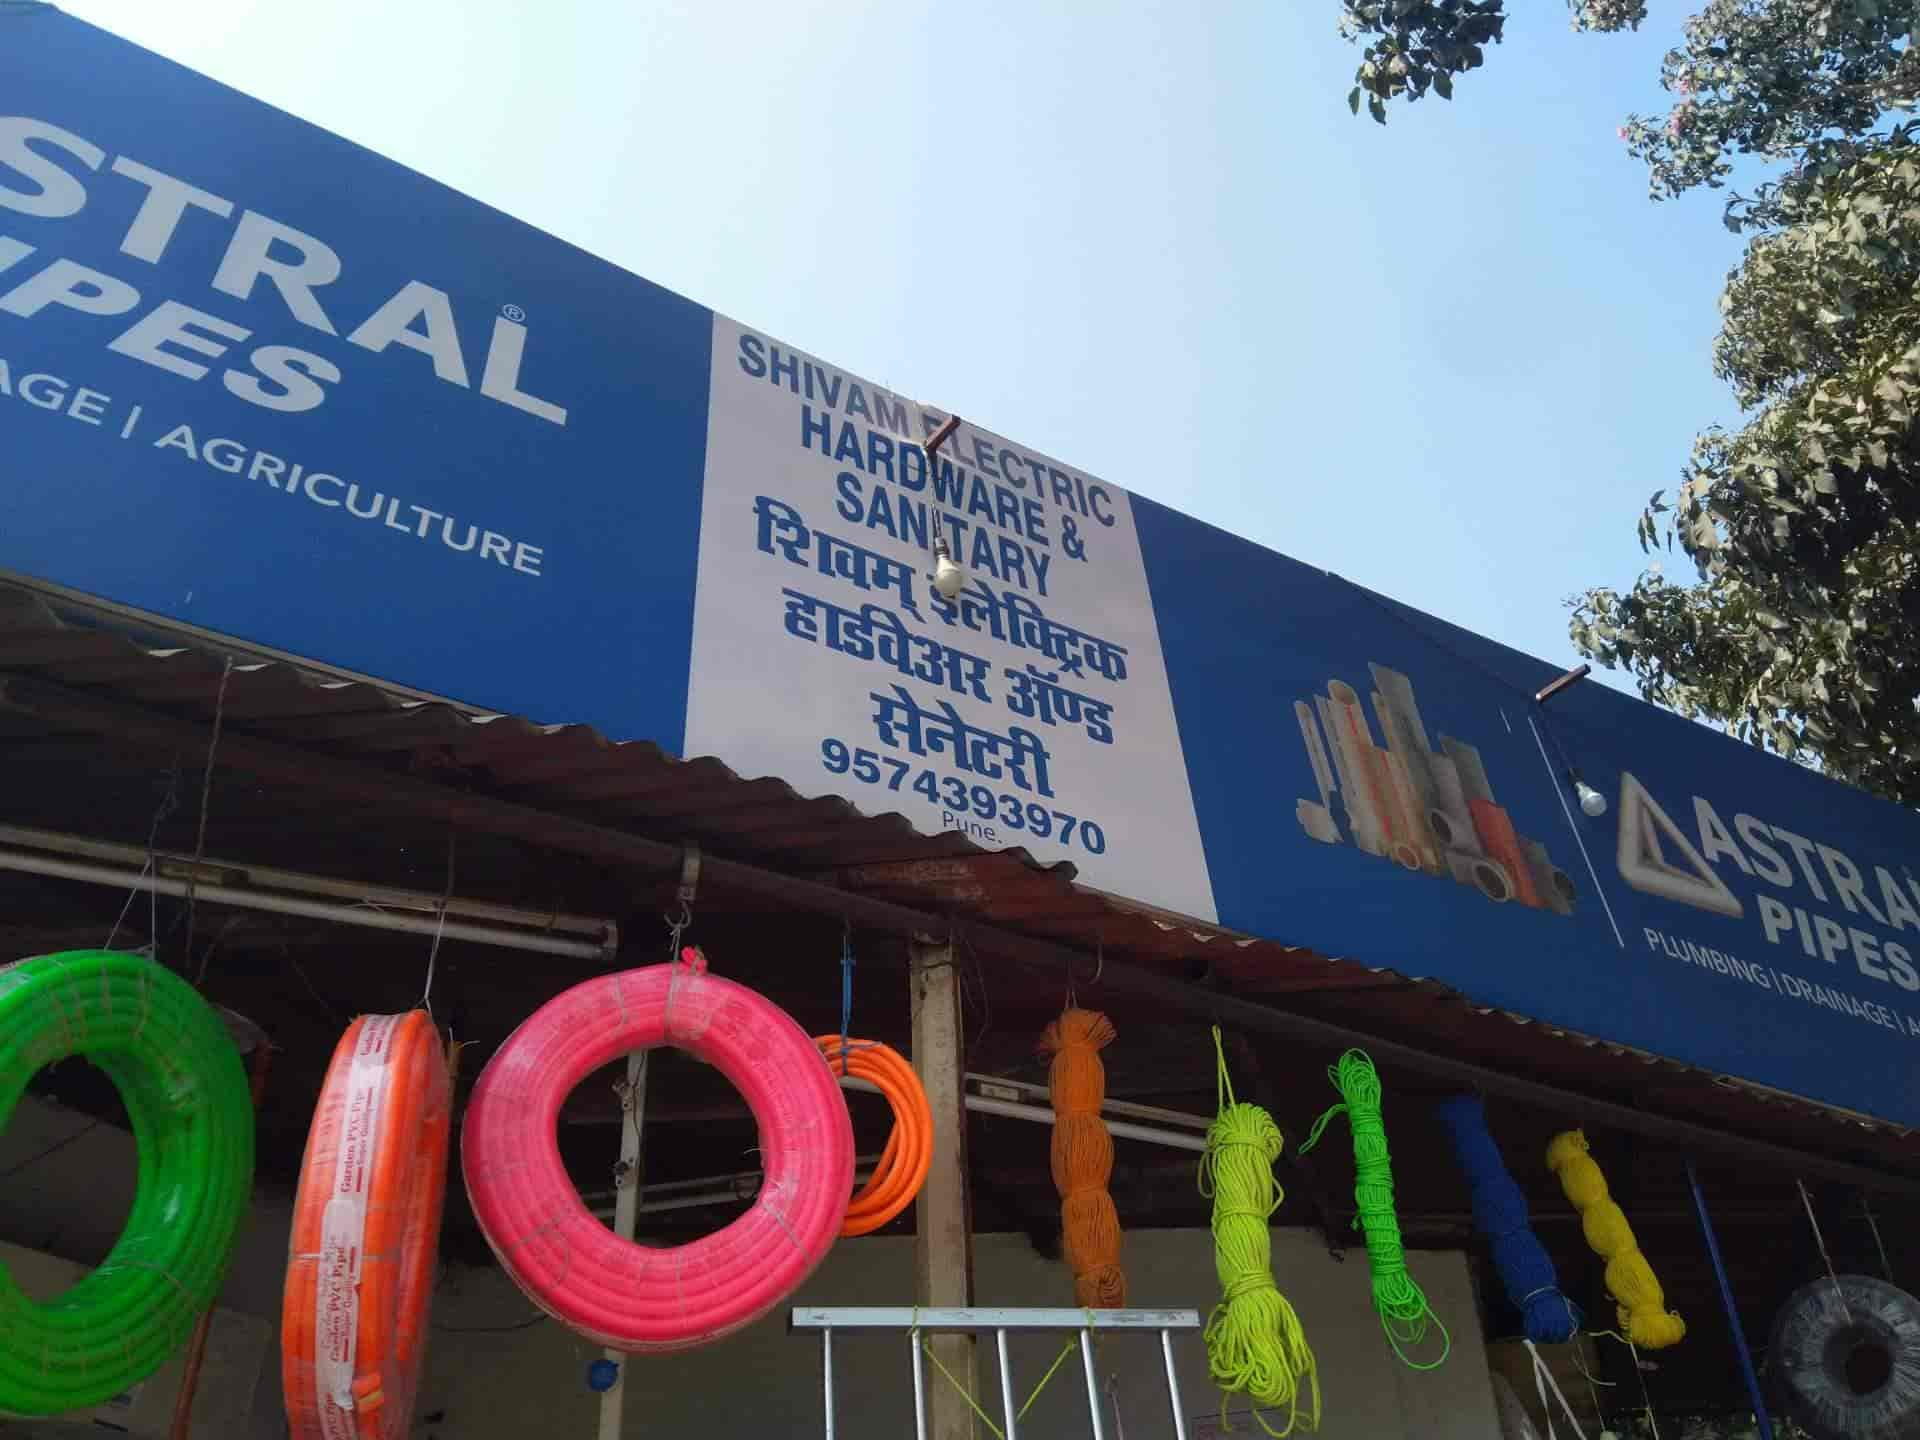 Shivam Electric Hardware & Sanitary, Ravet - Hardware Shops